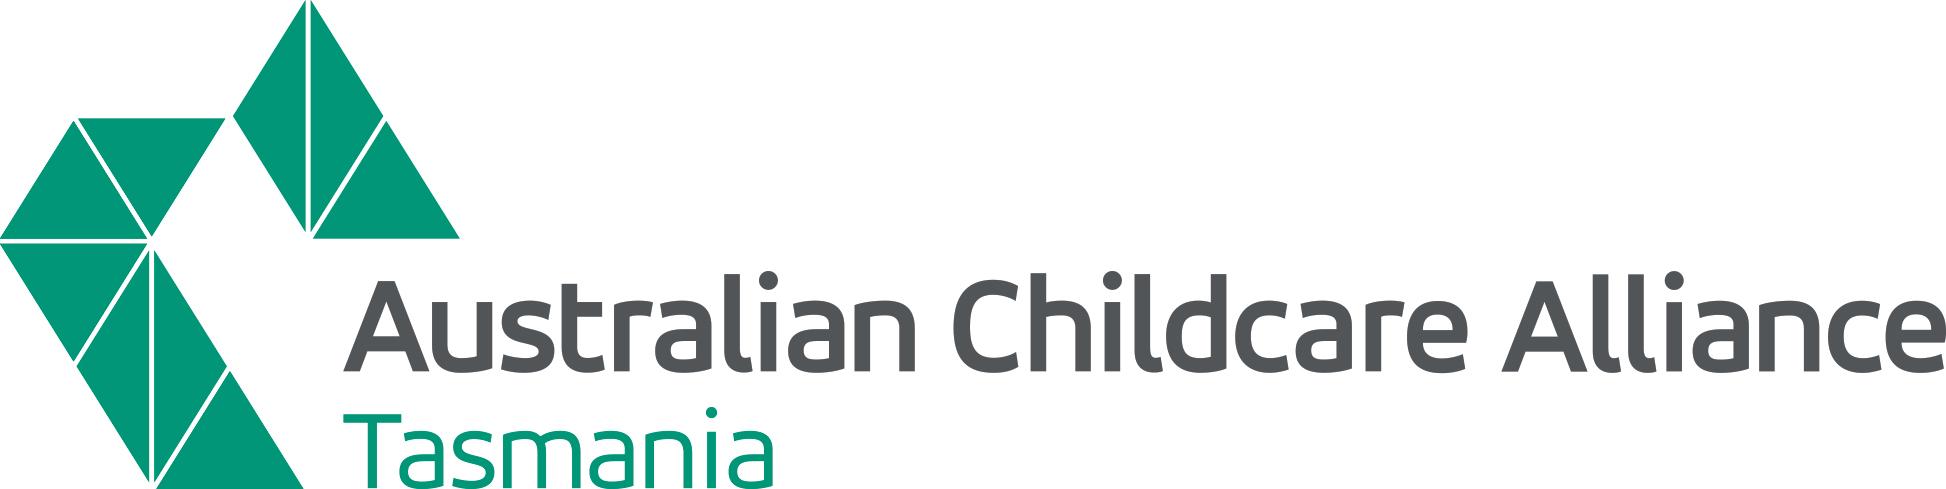 Australian Childcare Alliance Tasmania